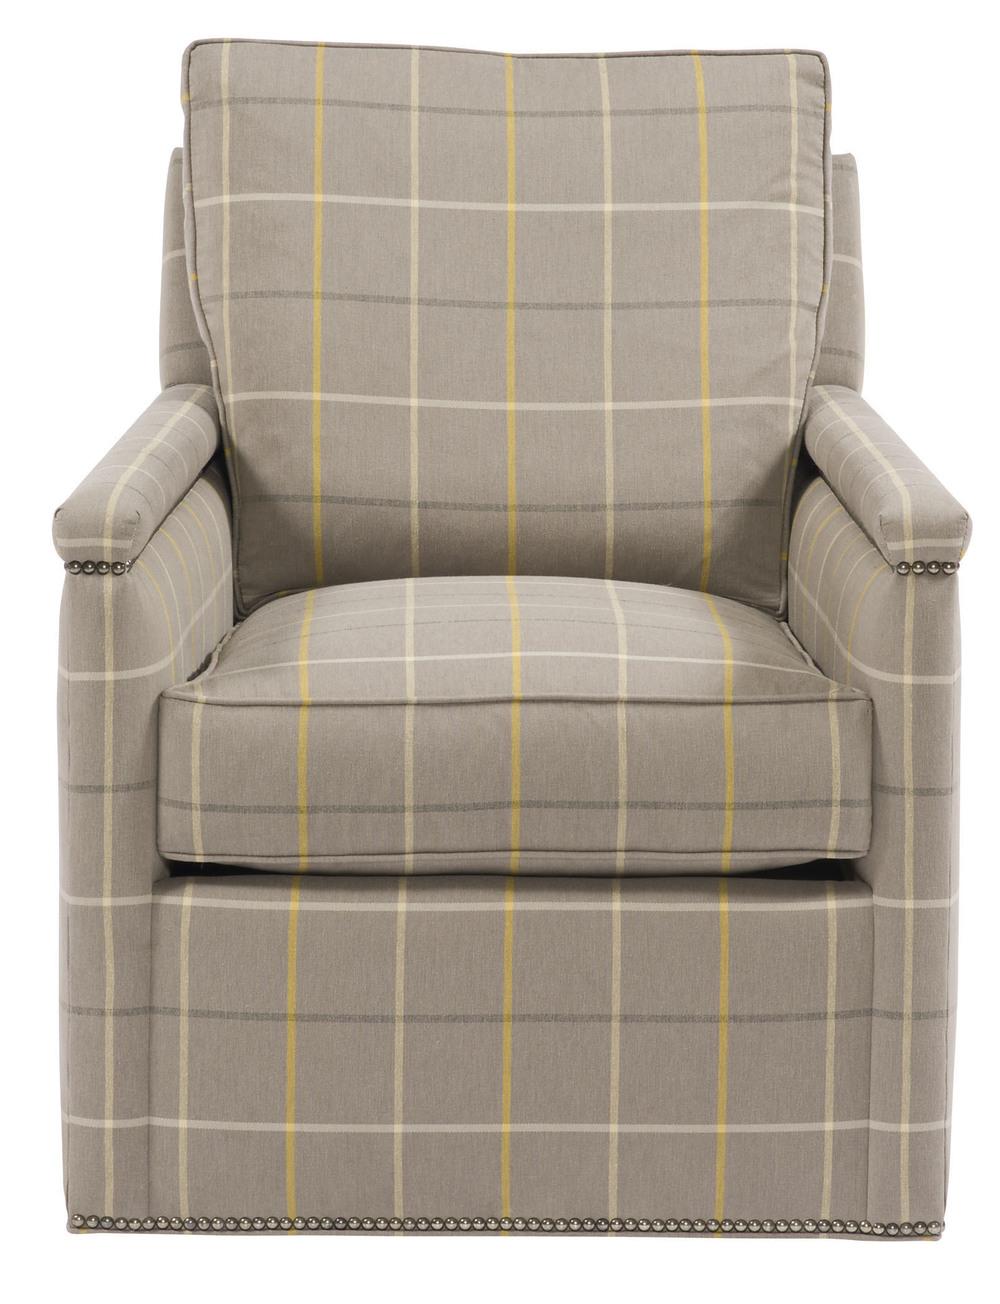 Vanguard Furniture - Liz Chair